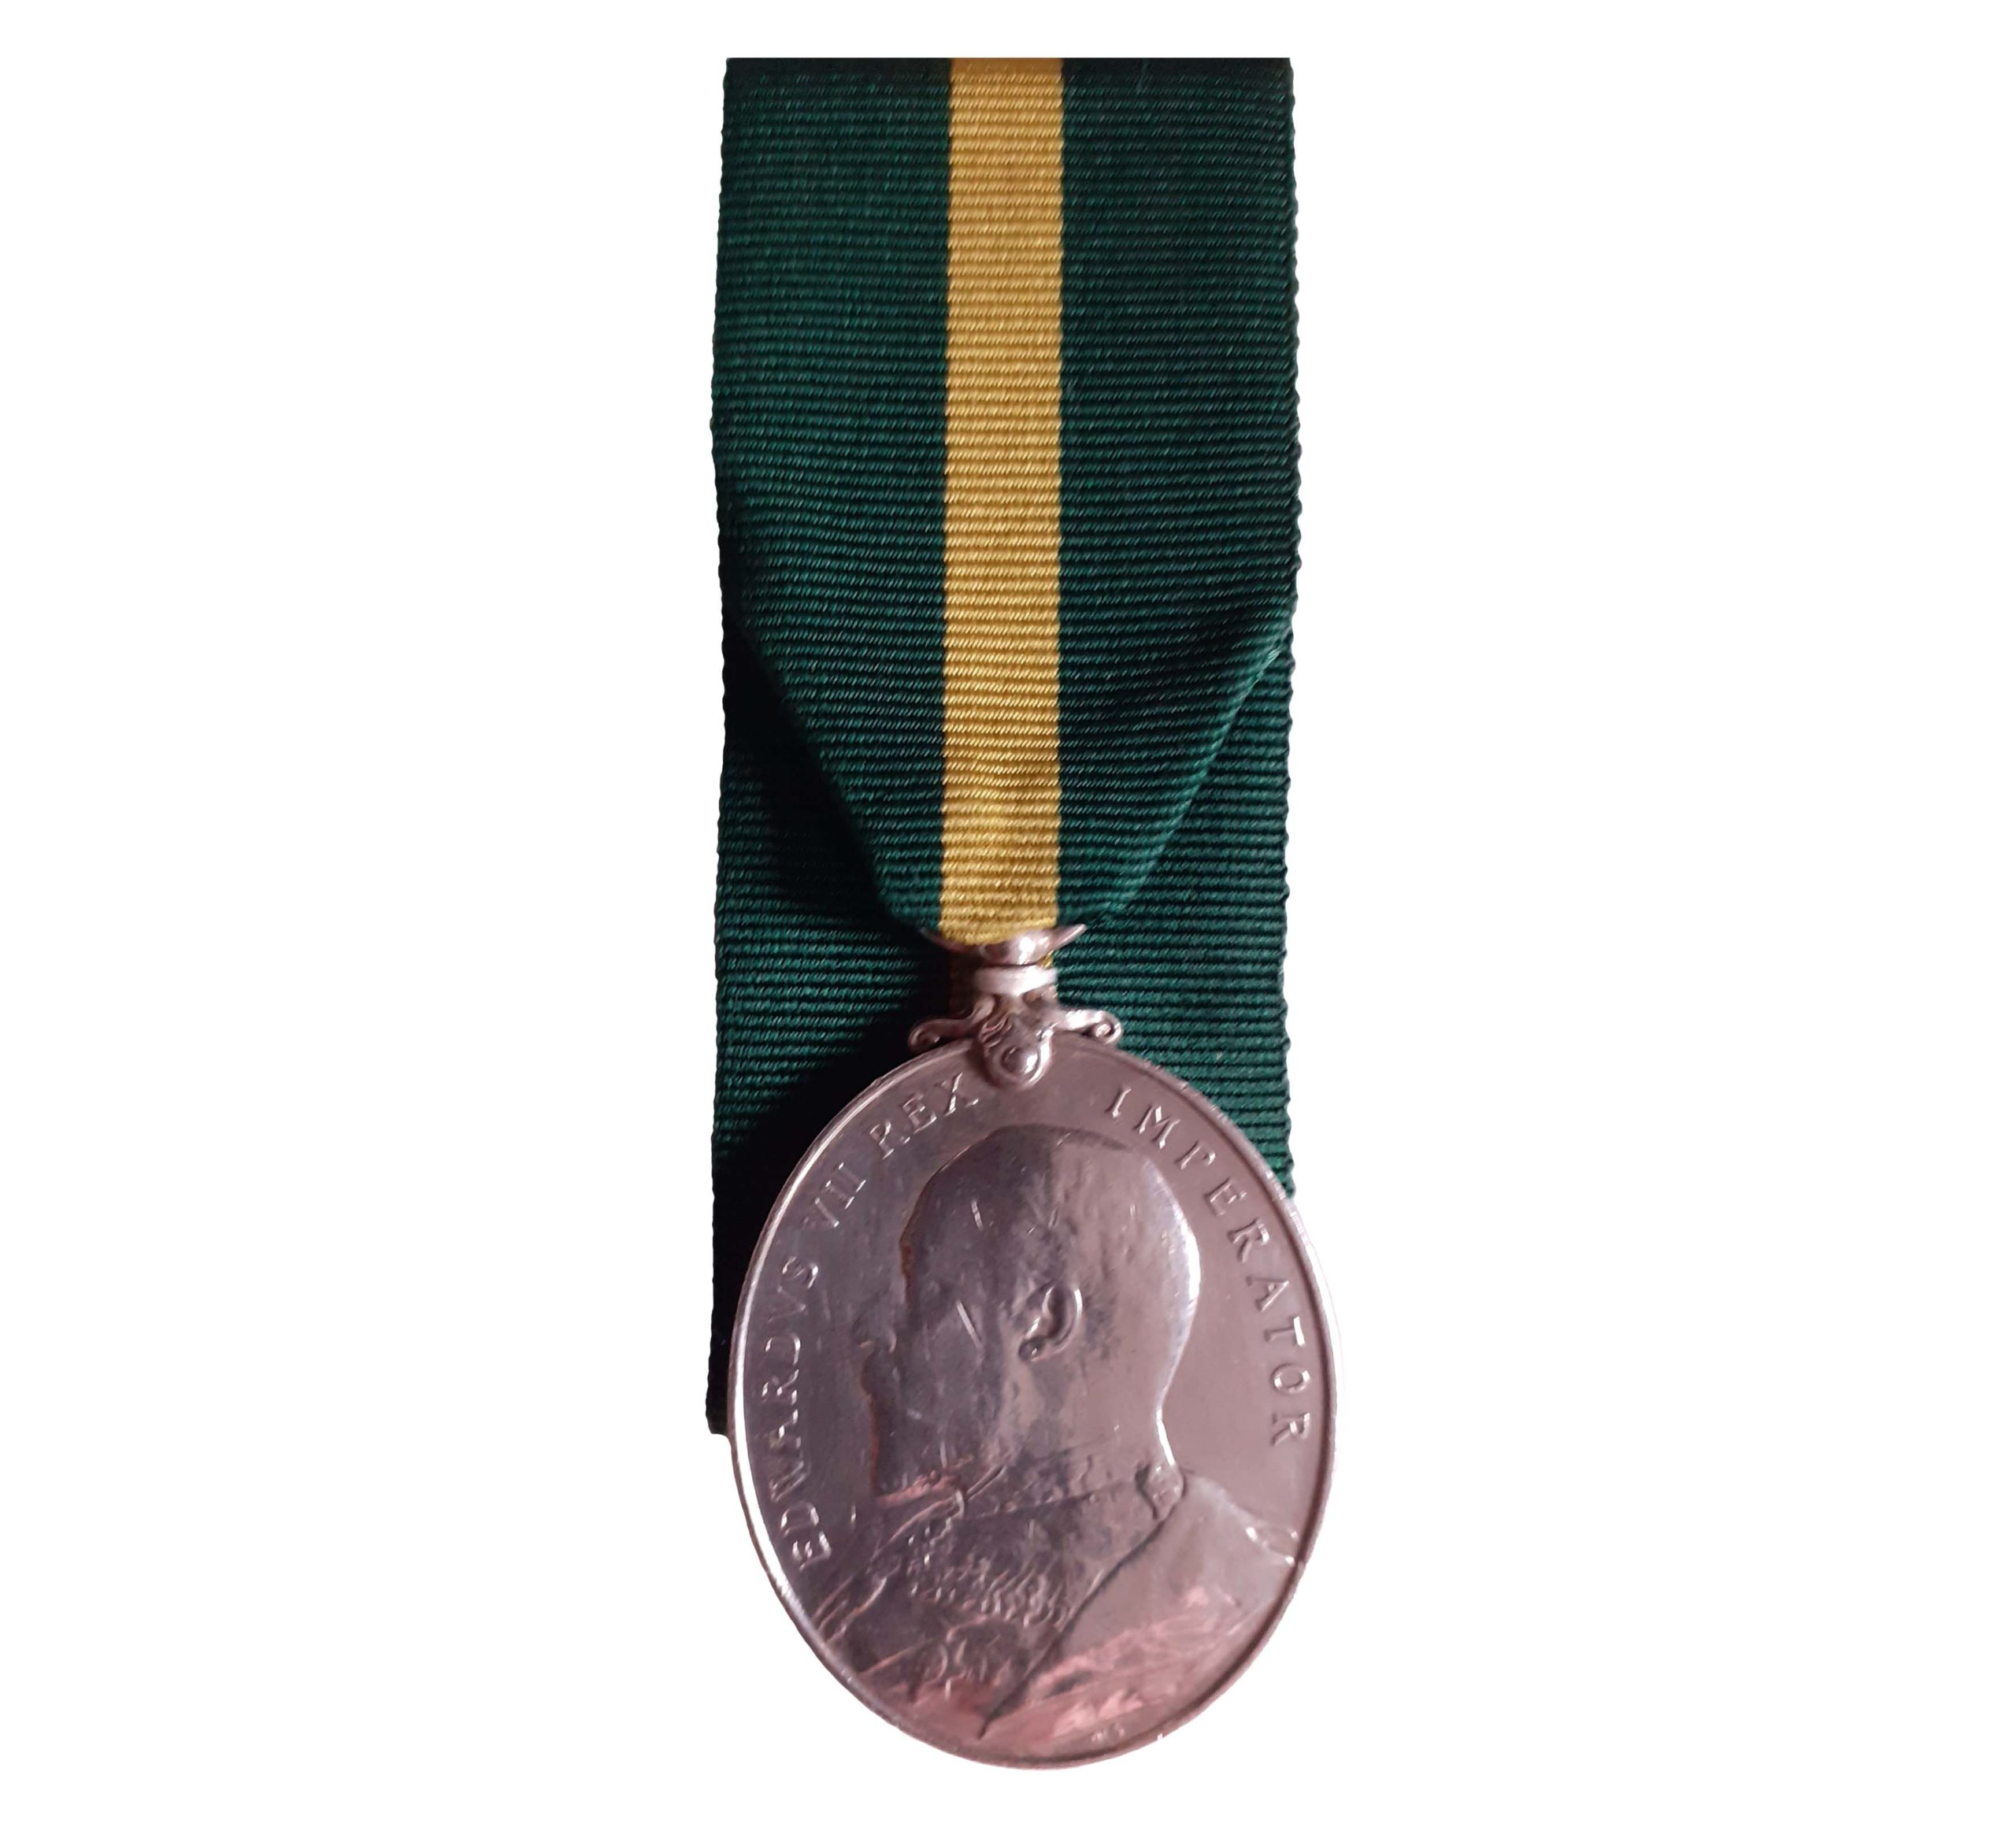 Territorial Force Efficiency Medal, EViiR, awarded to Serjeant J.T. Cosser